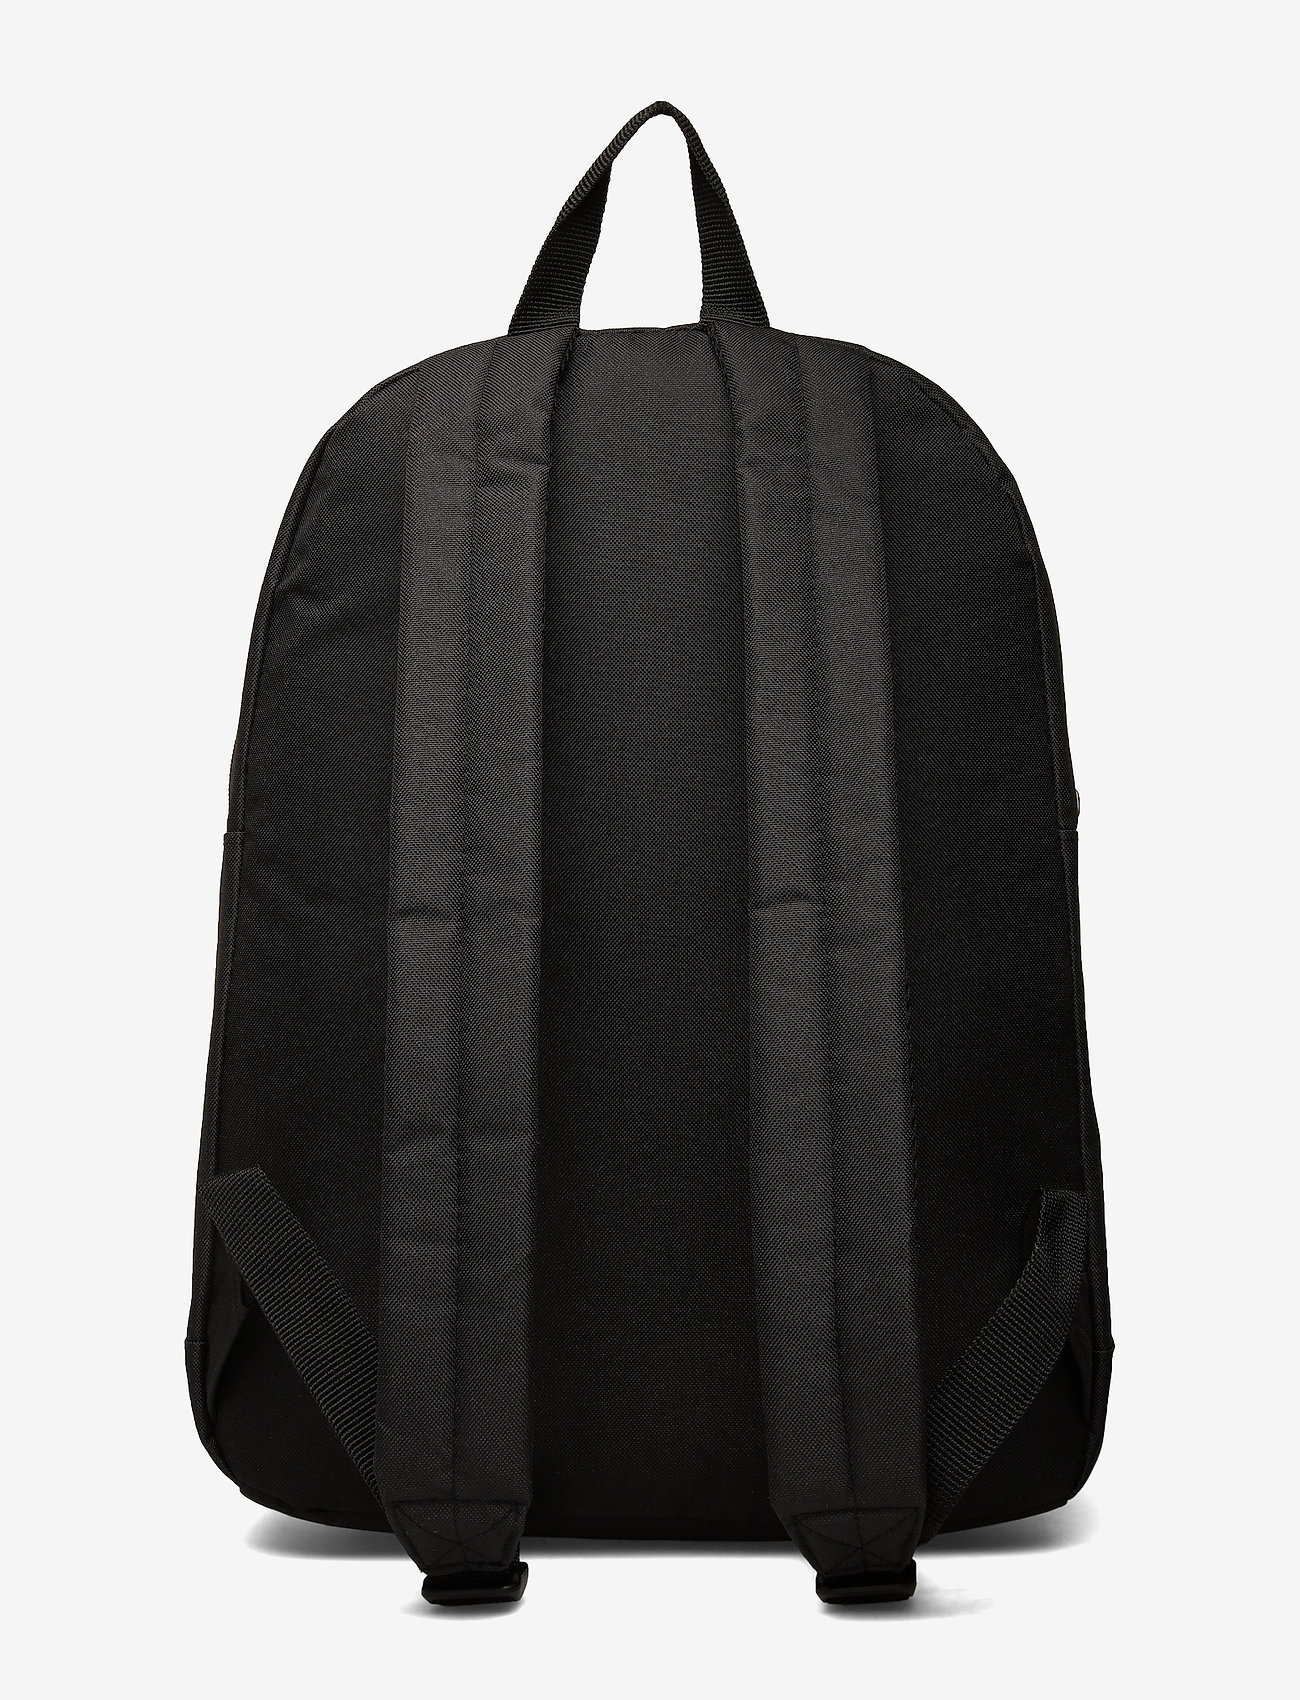 Lyle & Scott Backpack - Sacs A Dos True Black